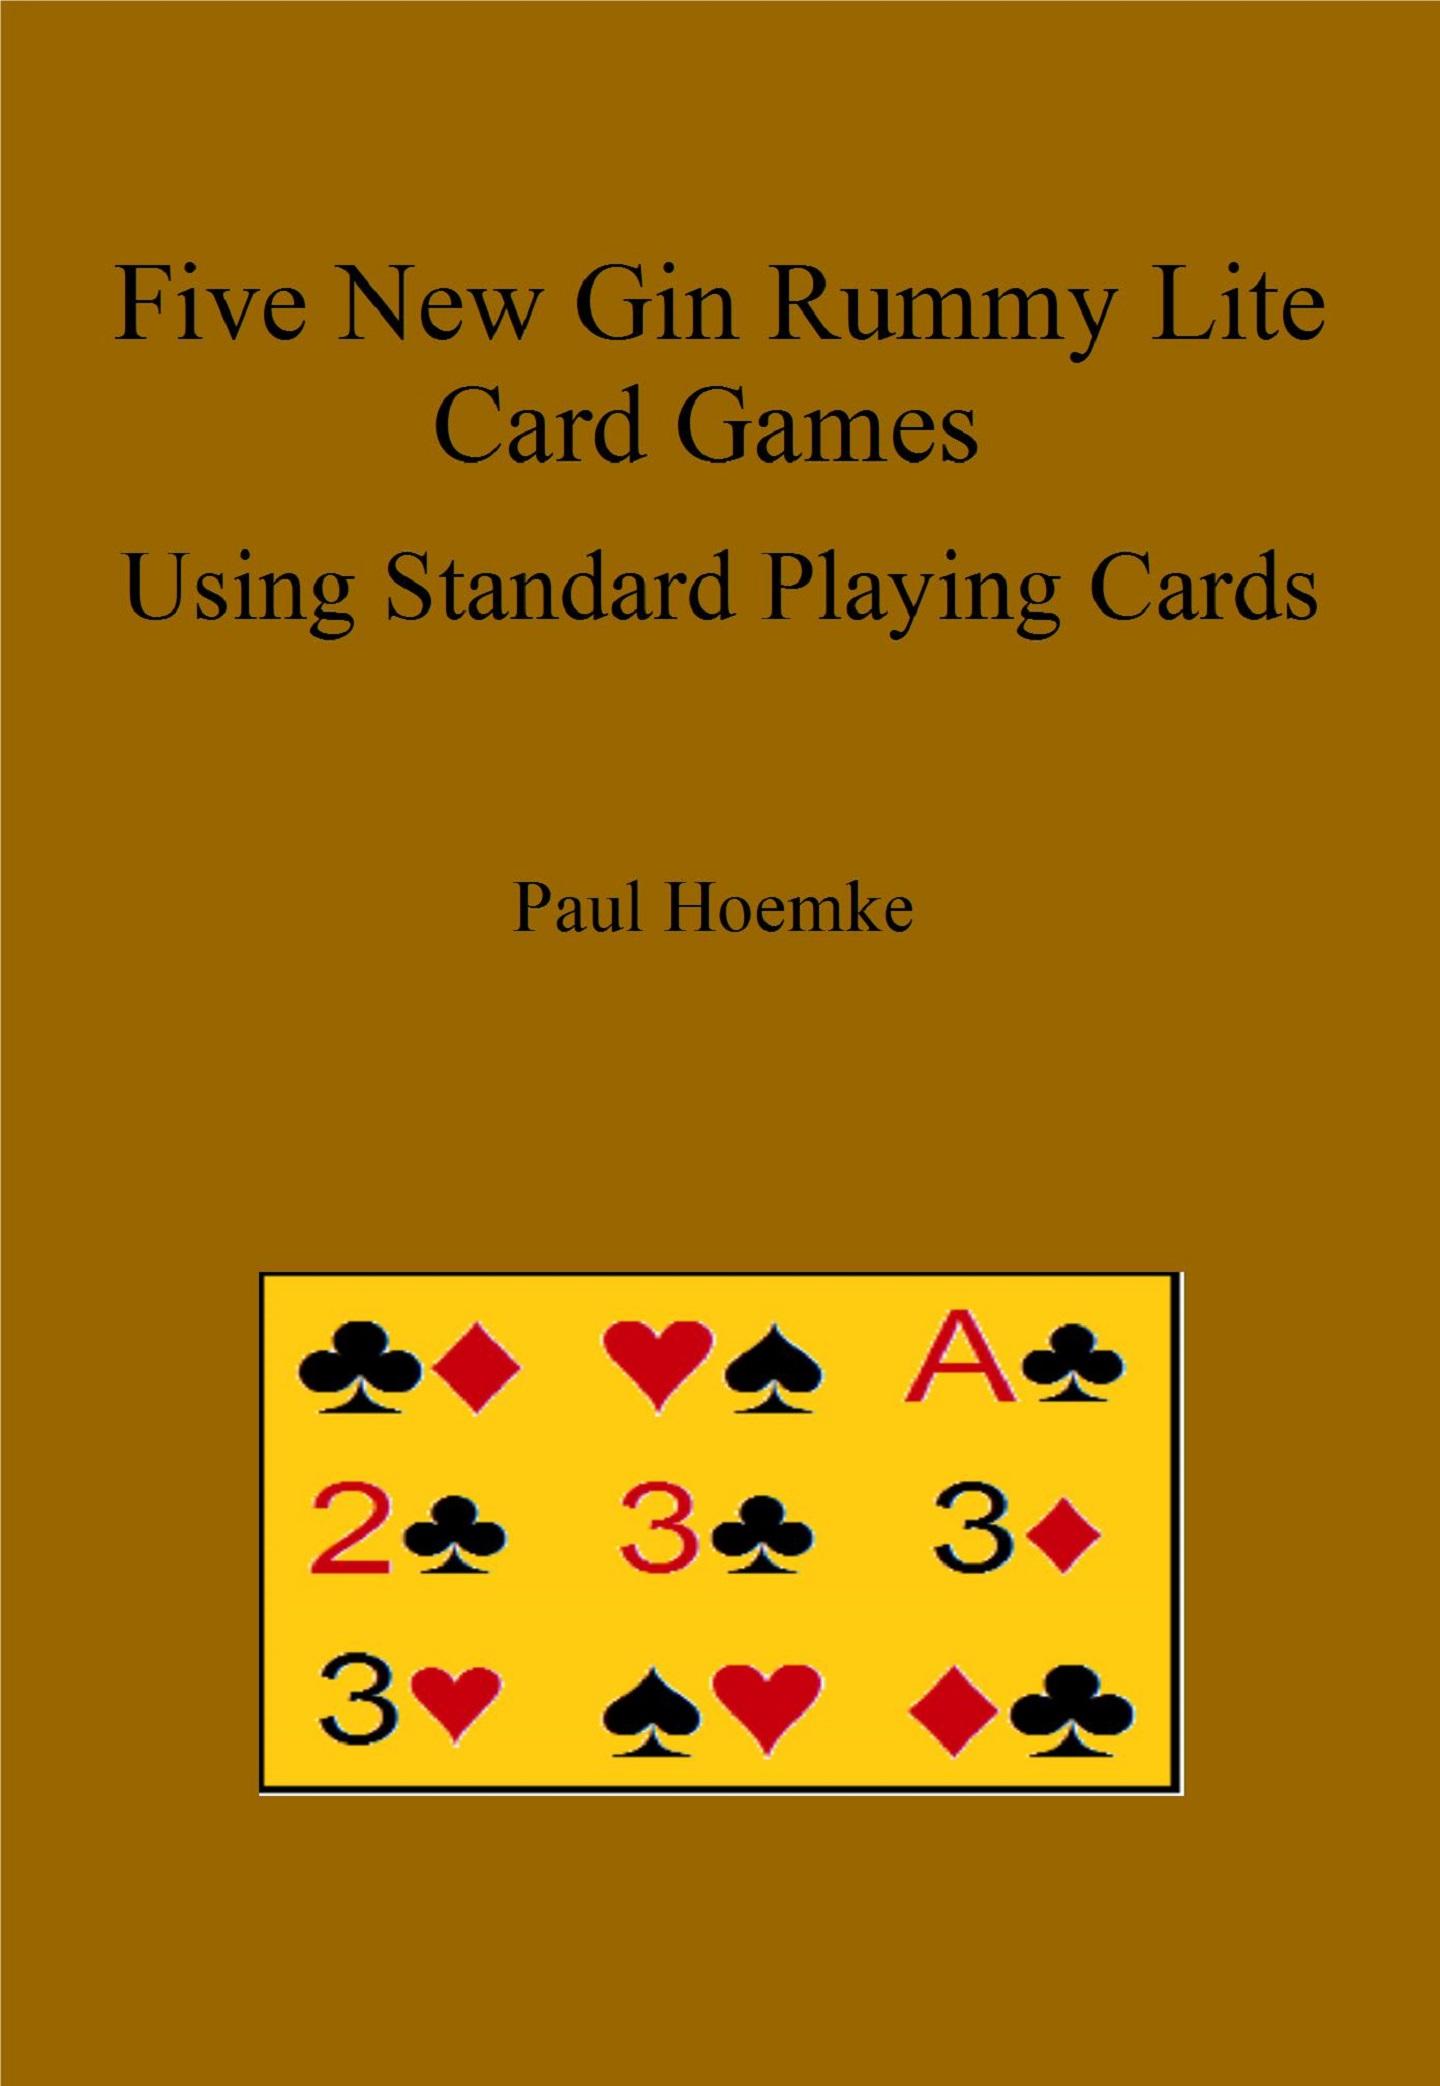 Smashwords Five New Gin Rummy Lite Card Games Using Standard